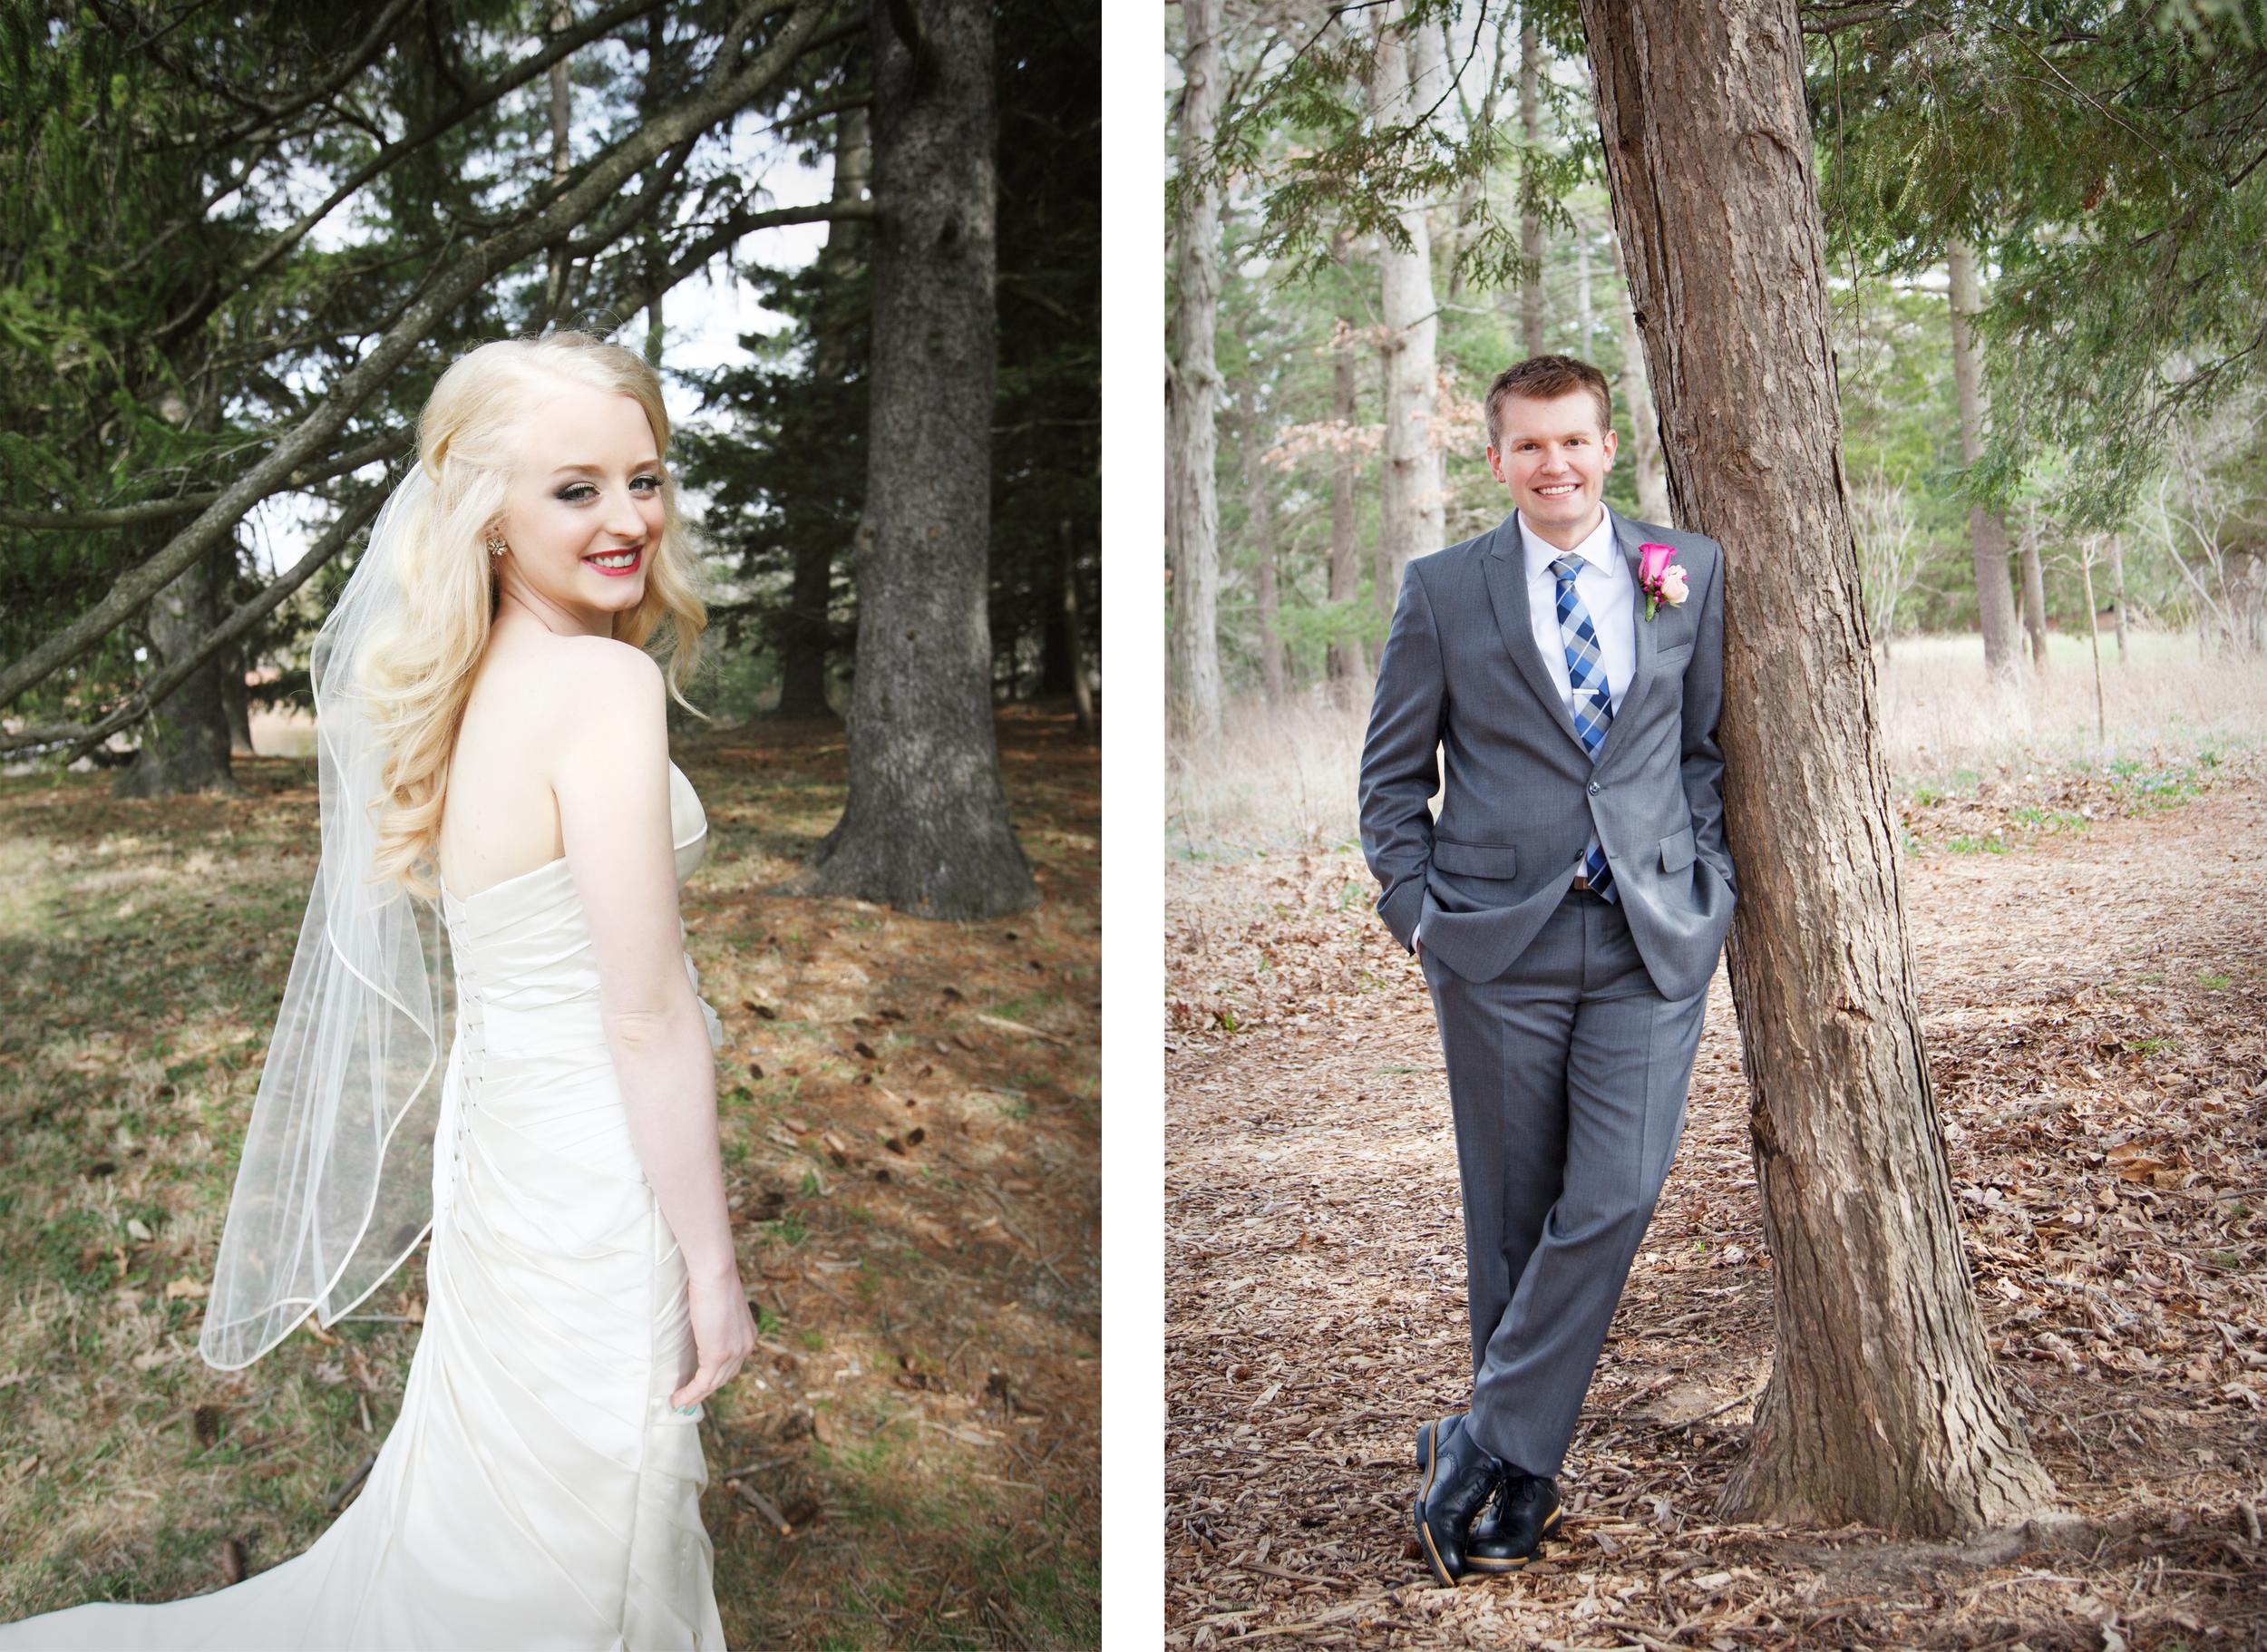 01_Fox_and_Hound_Photo_Wedding_Photography_4:12:14.jpg